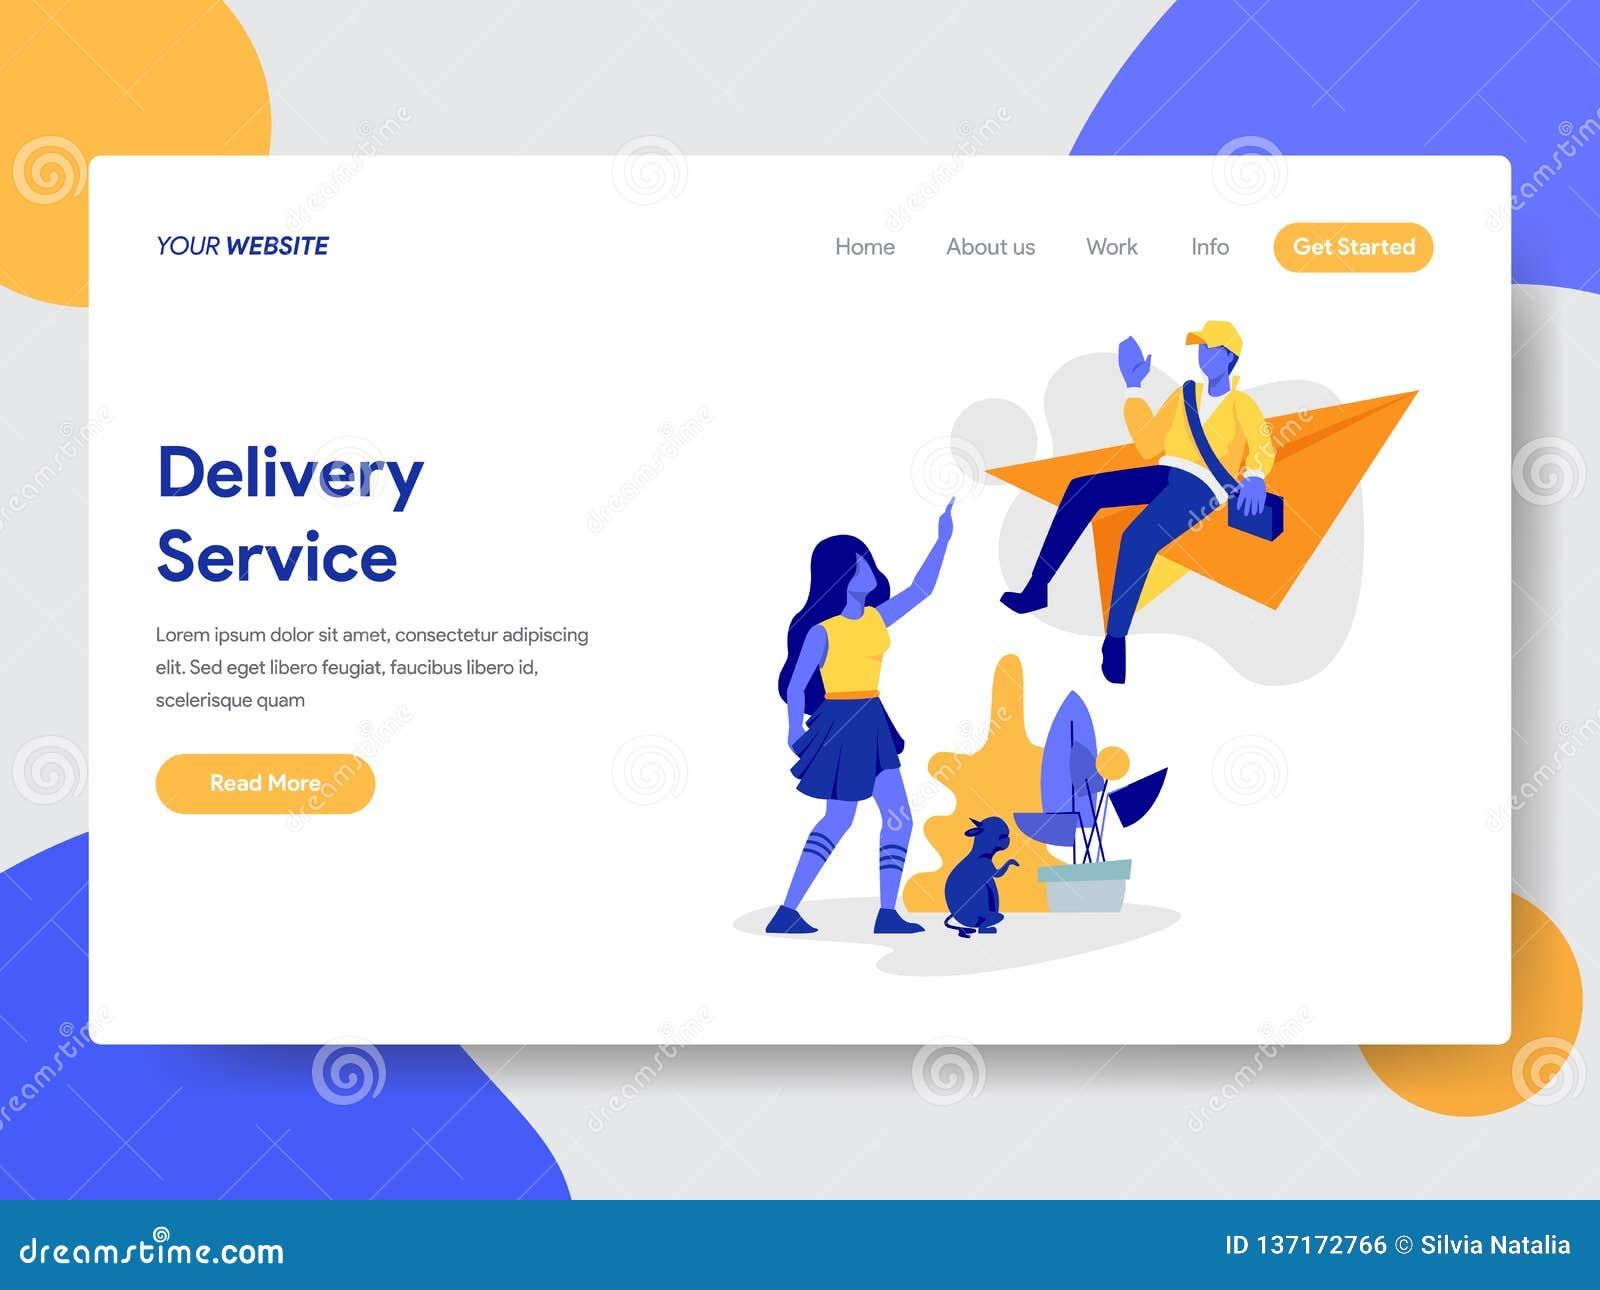 Landing page template of Online Delivery Service Illustration Concept. Modern flat design concept of web page design